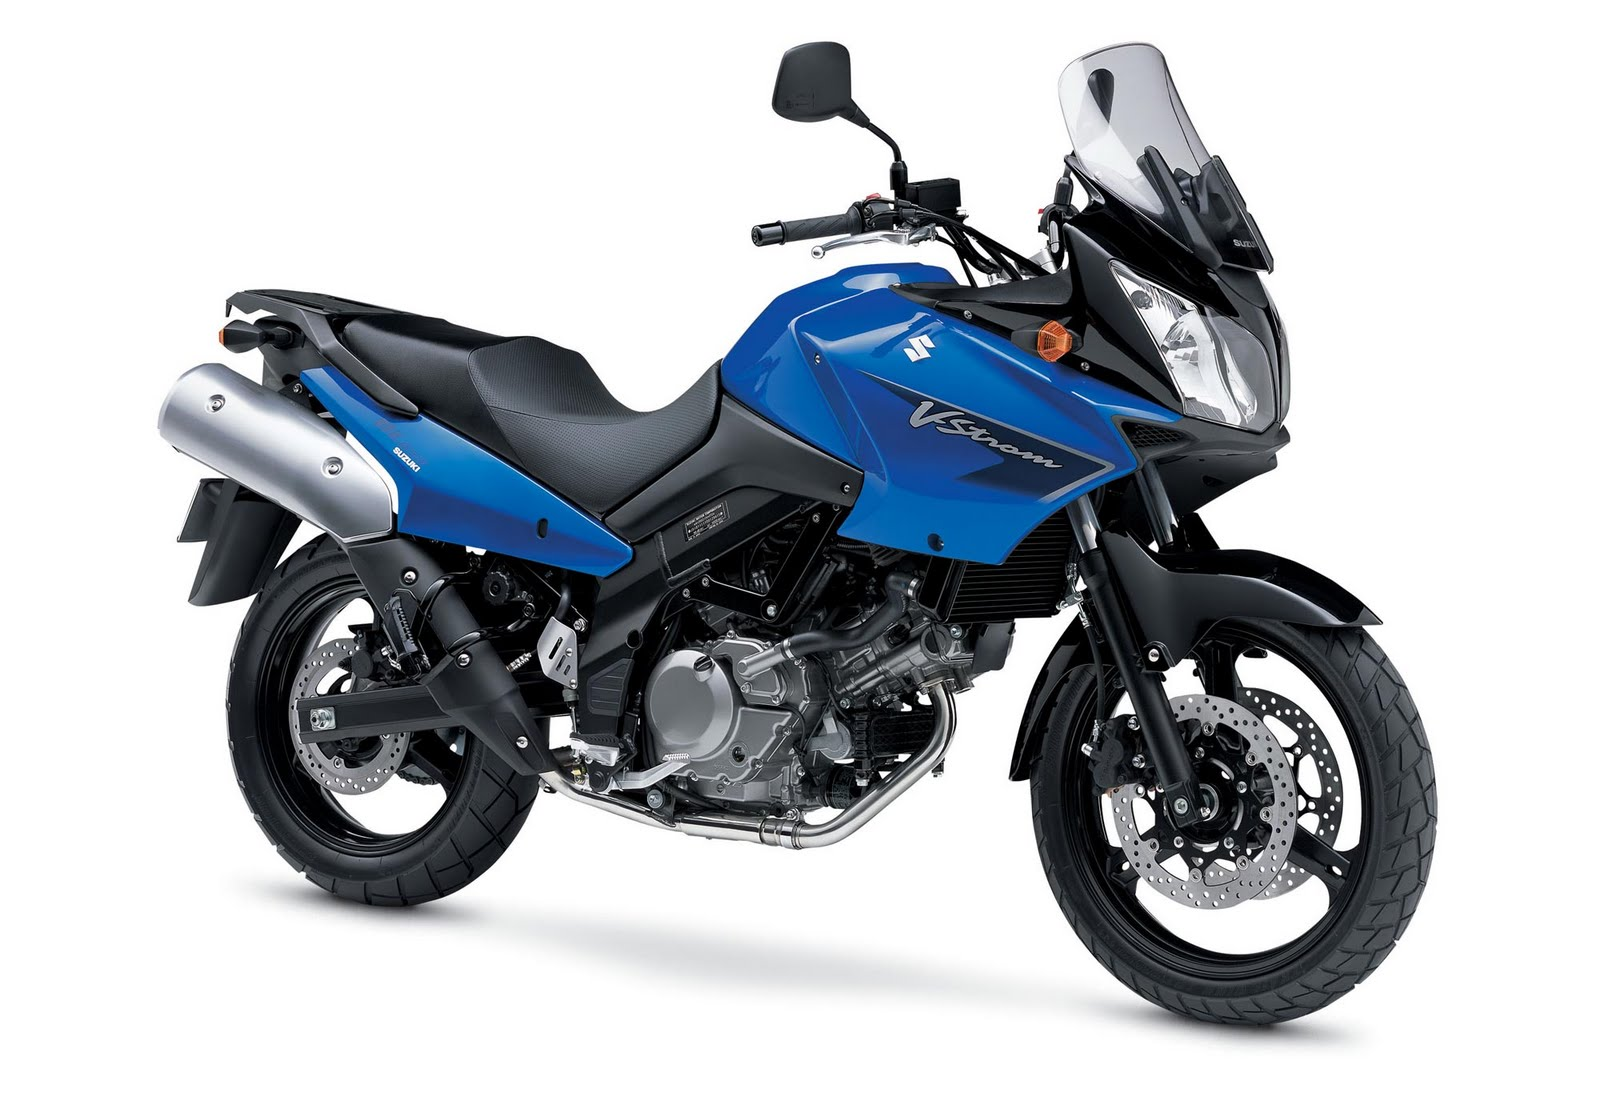 http://3.bp.blogspot.com/-qx8DsVTegOE/TnyuLgZGlvI/AAAAAAAAAiM/yqNln188HHc/s1600/2007-Suzuki-V-StromDL650a-701102.jpg